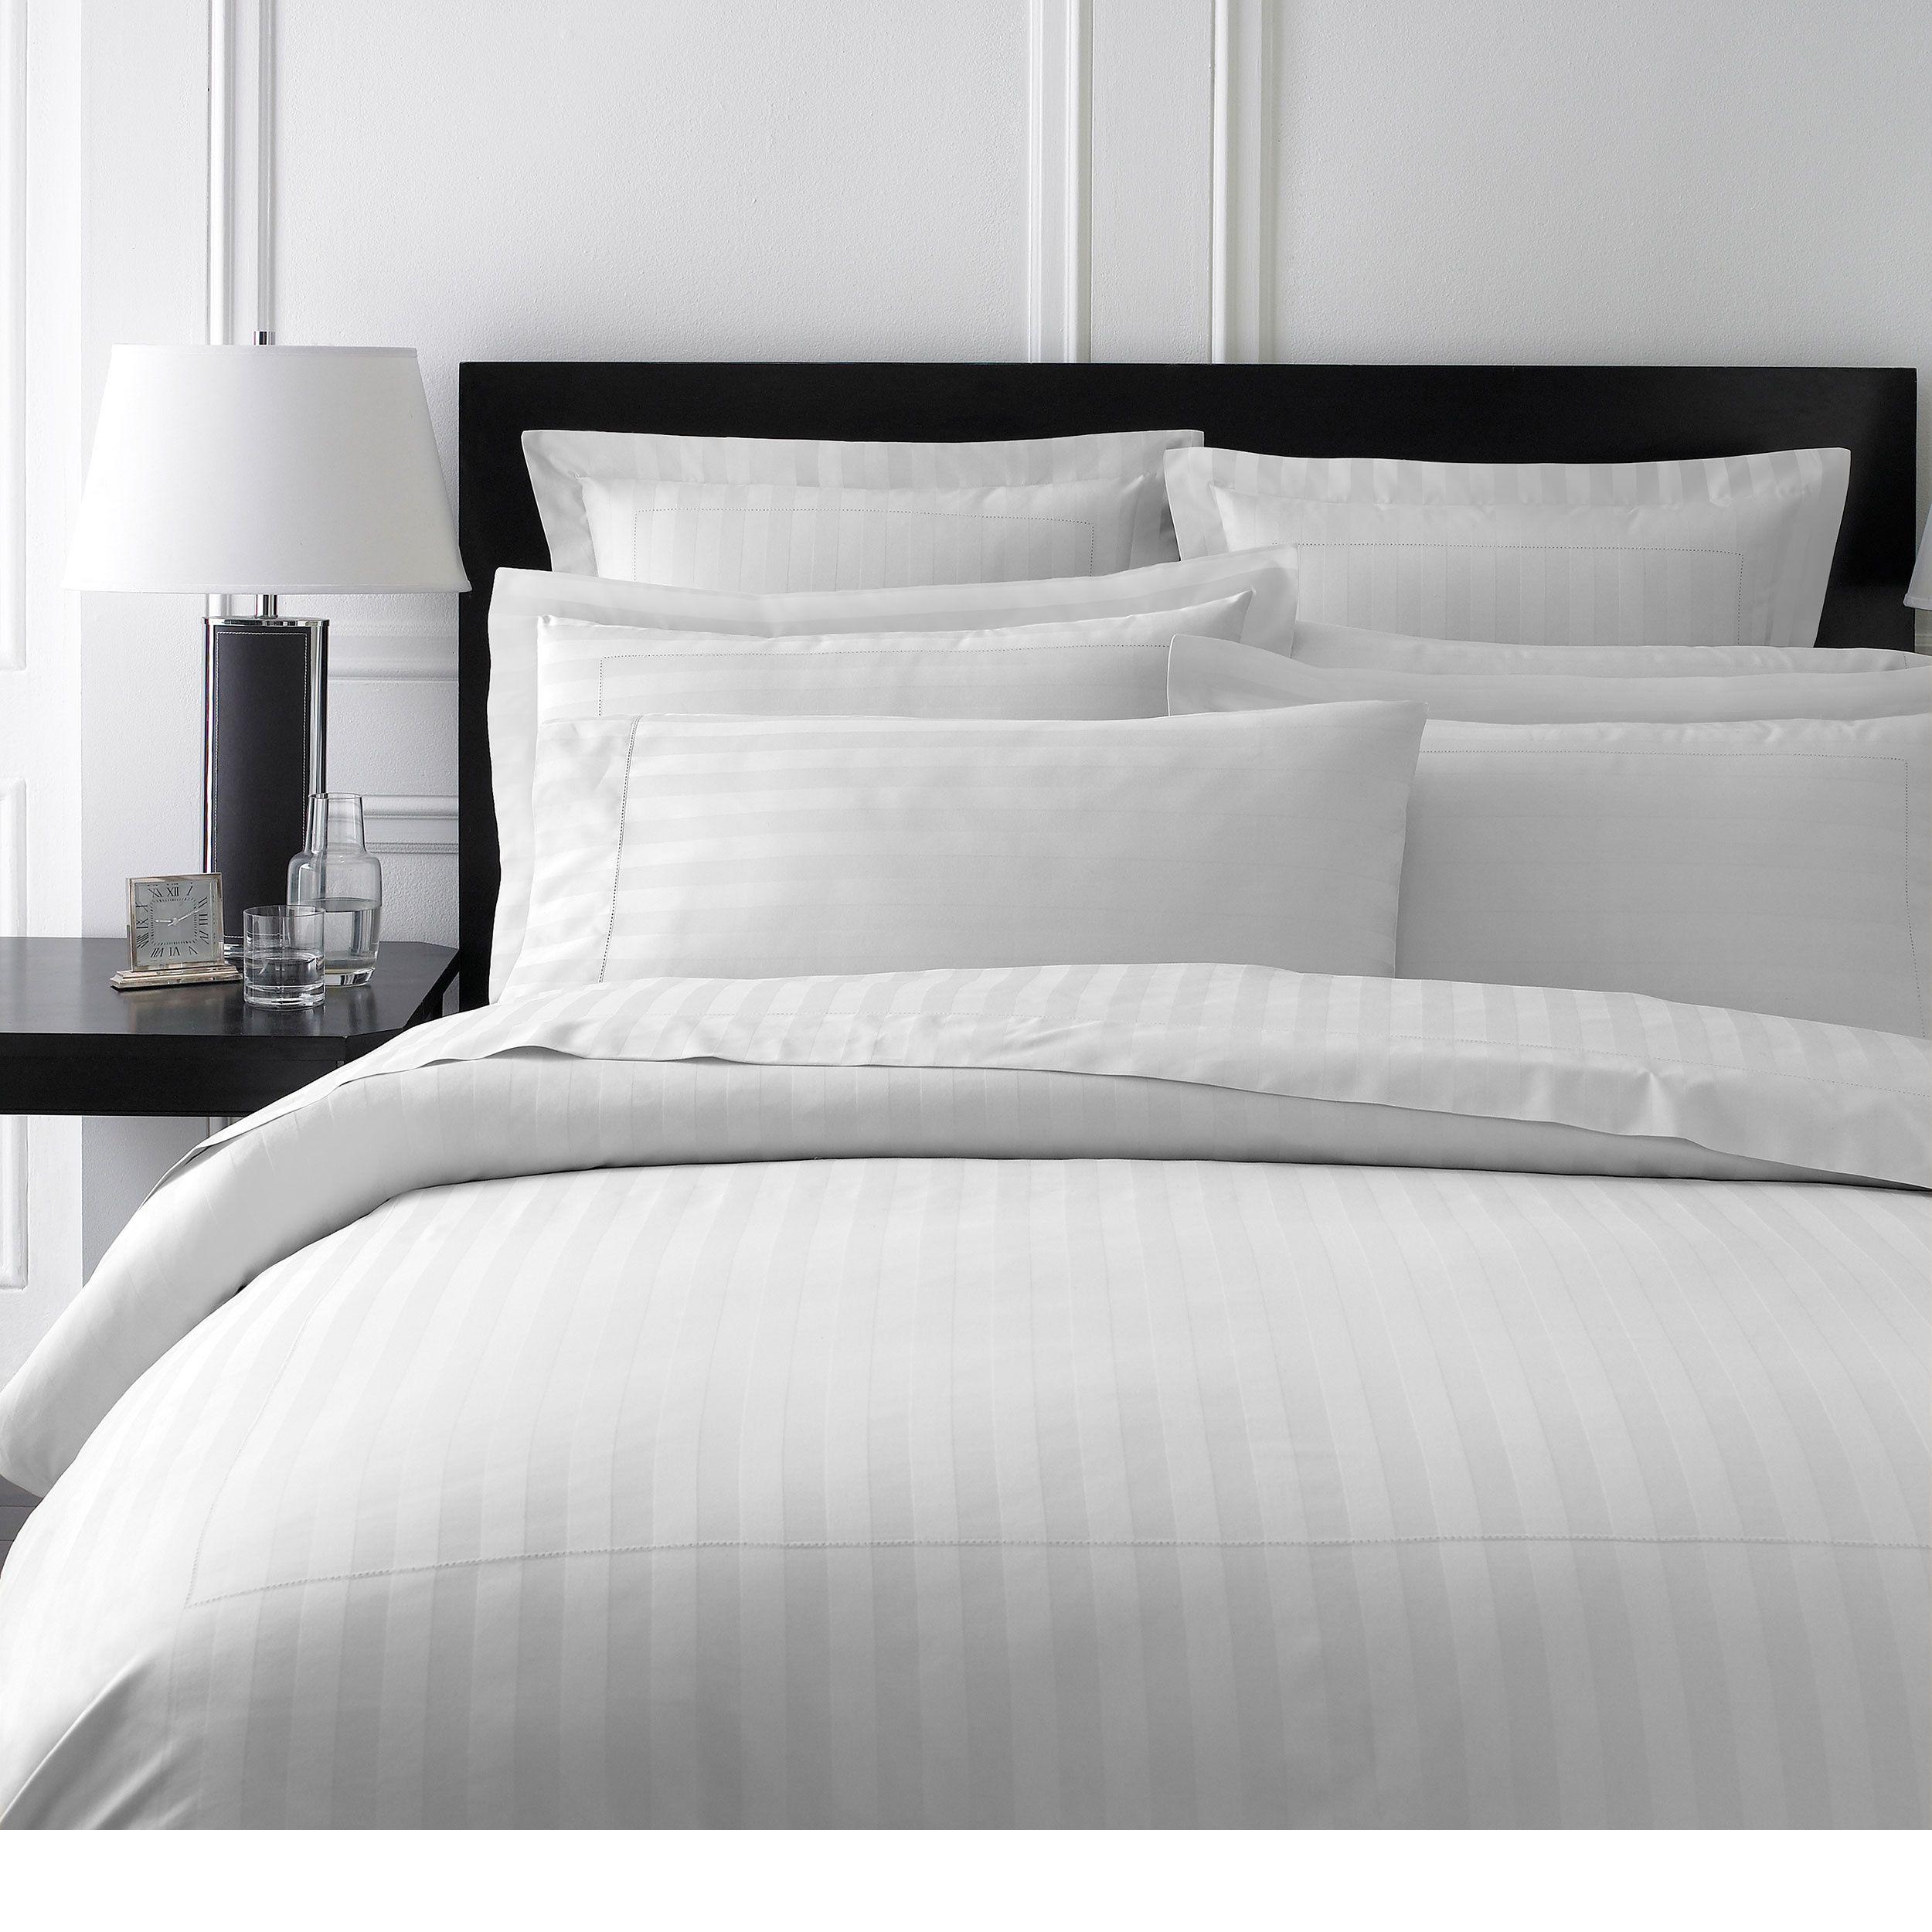 mandala comforter cotton set king size hp duvet bedding indian duvets quilt boho decor doona cover